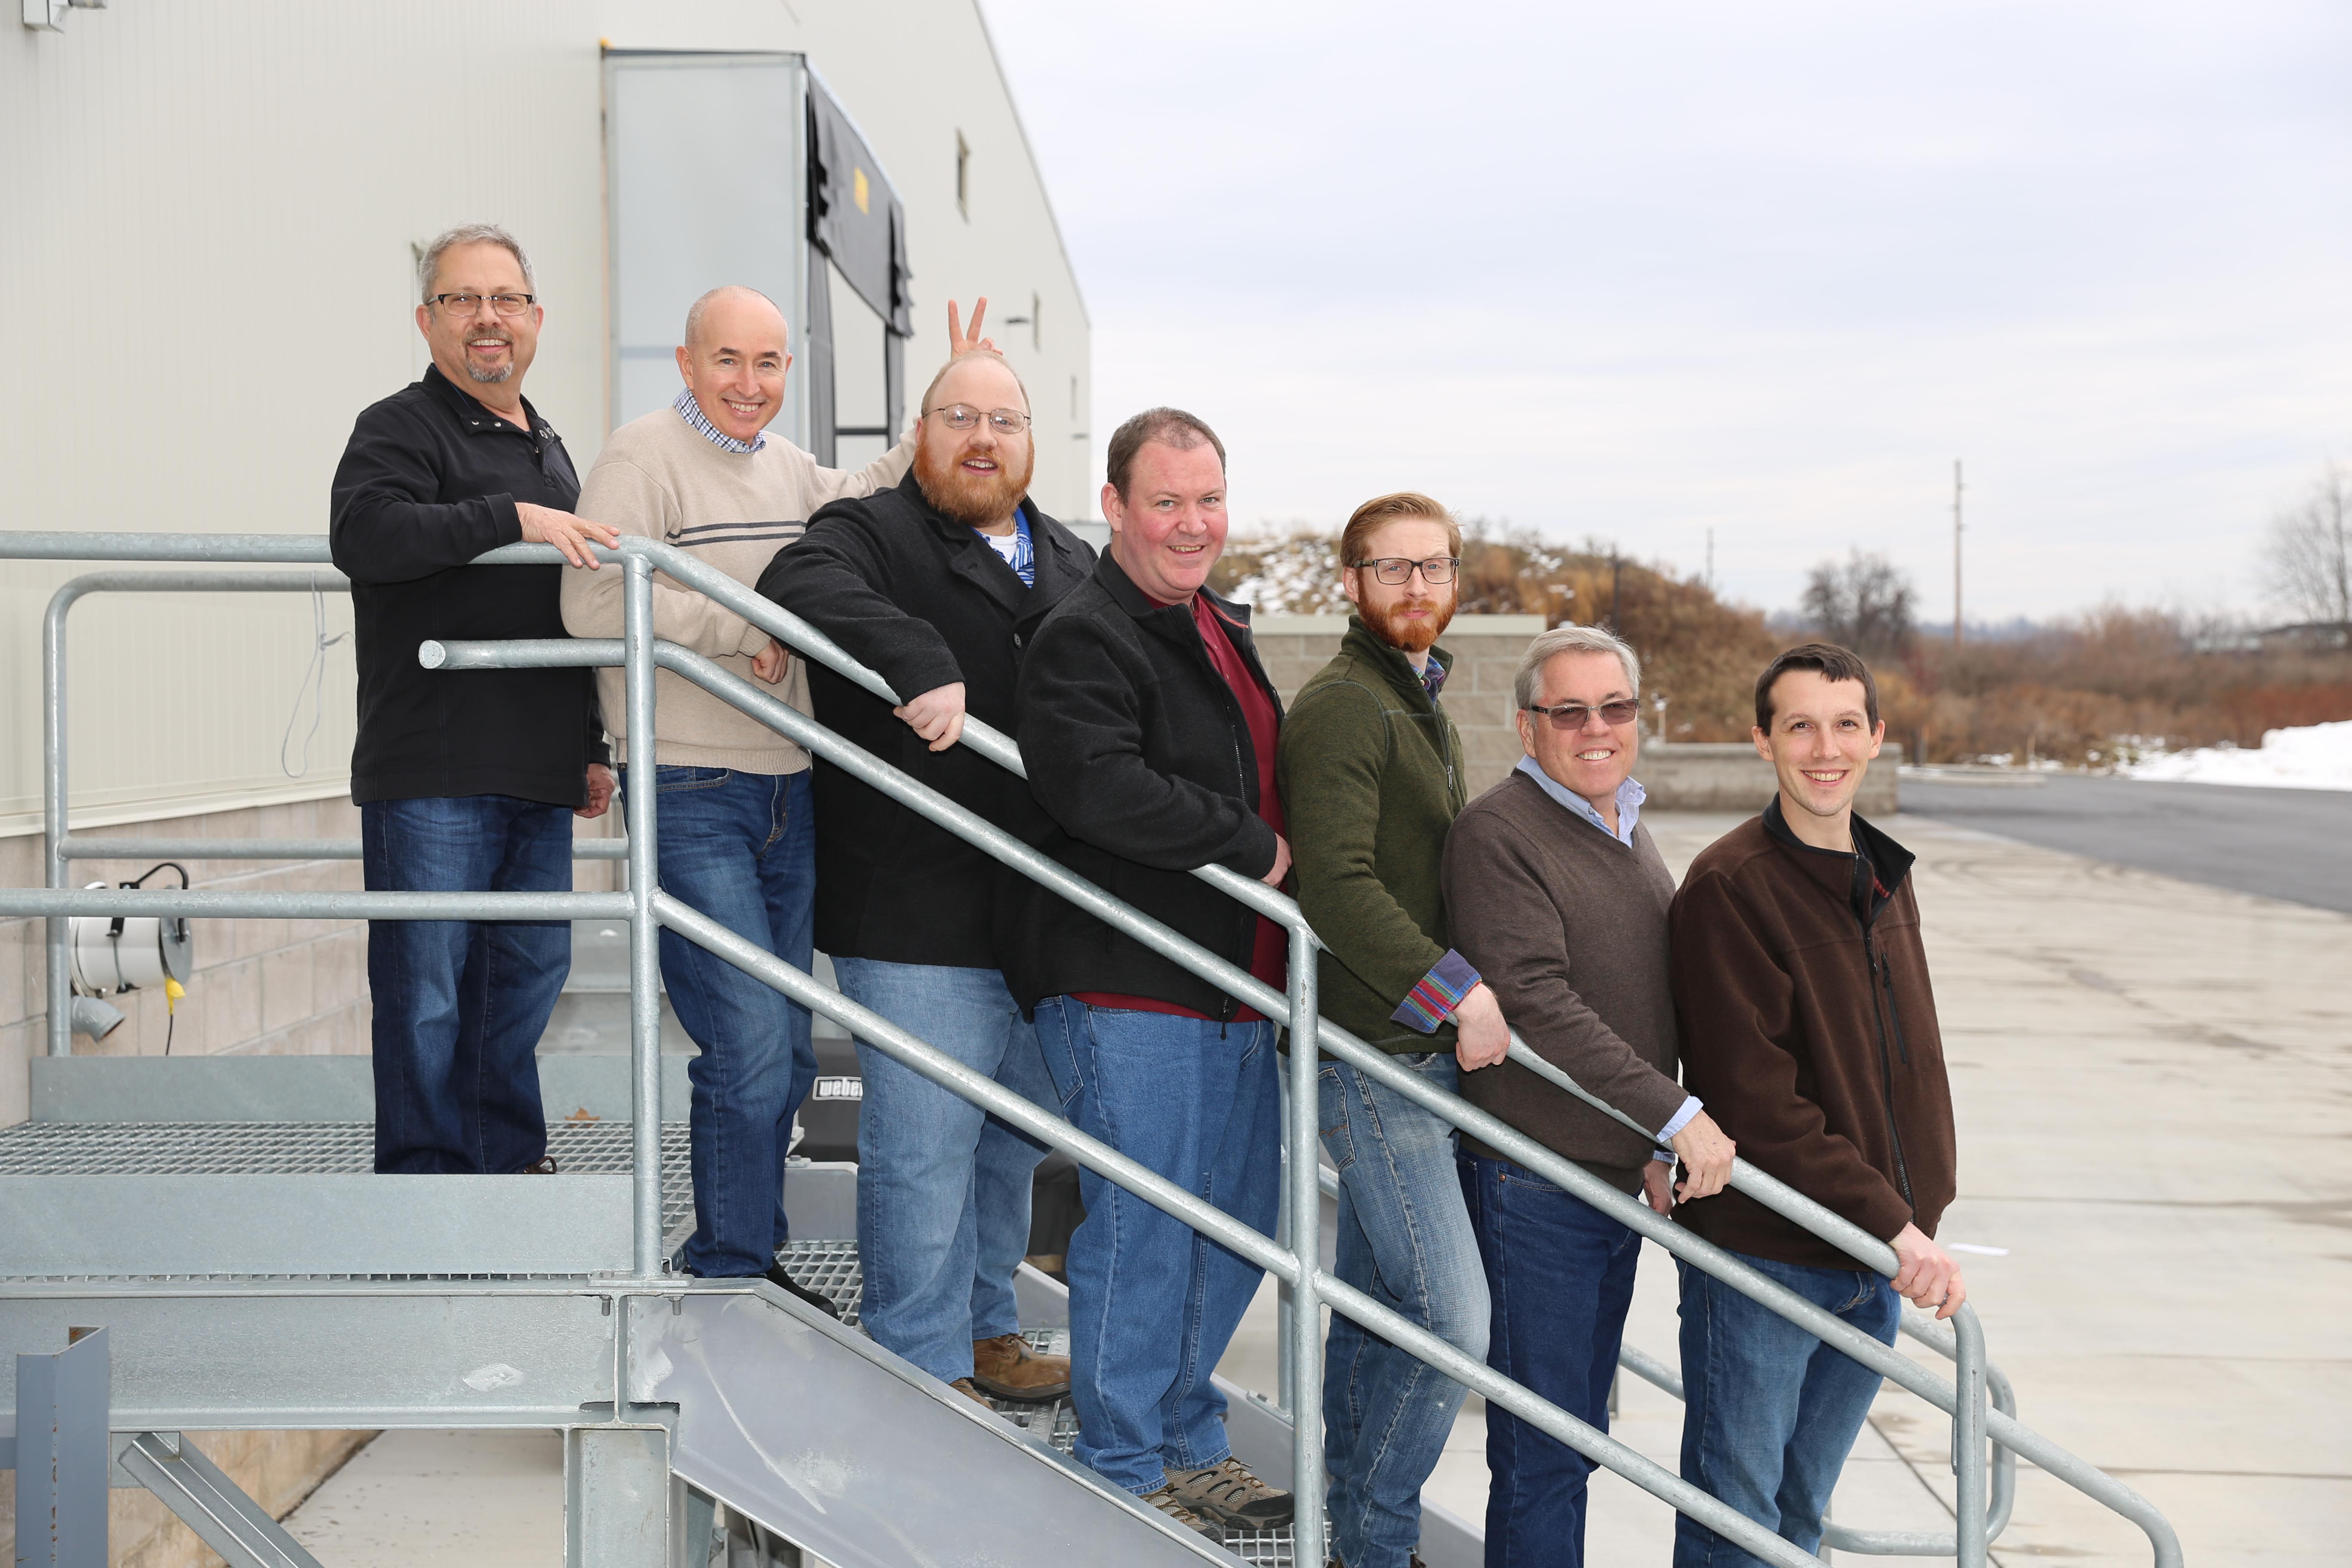 National Salesperson Day - Team photo